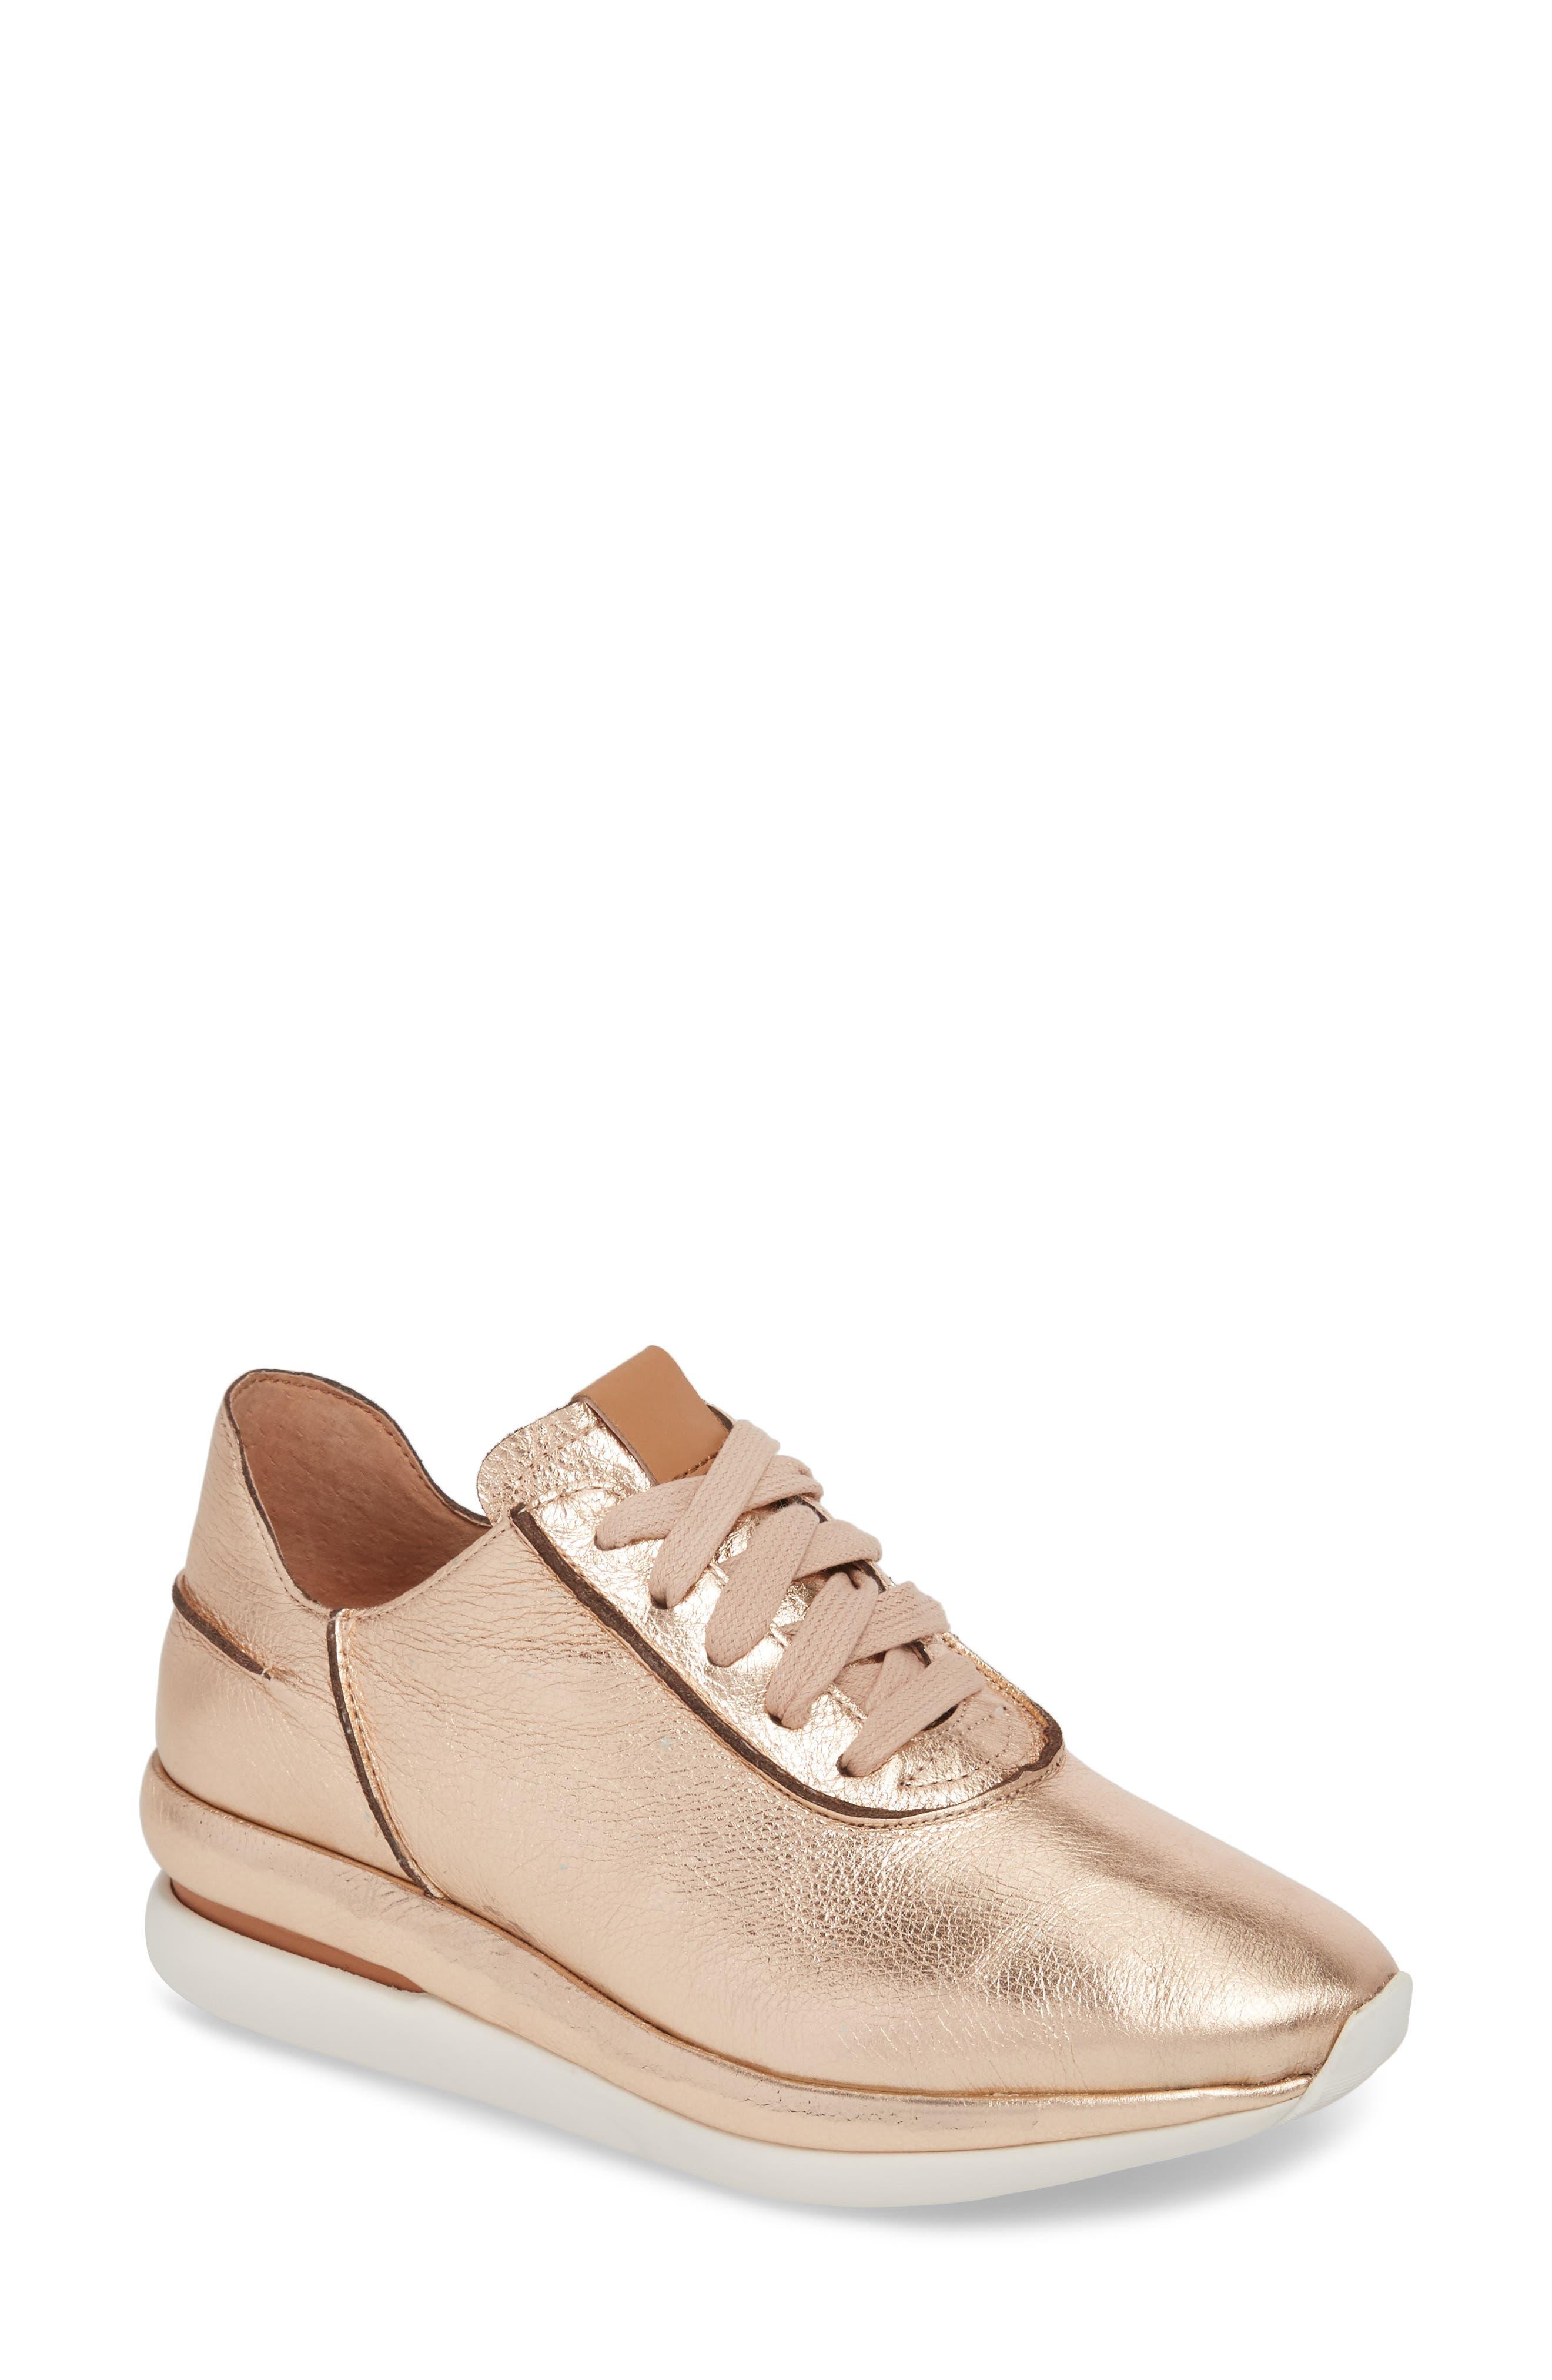 Raina Sneaker,                         Main,                         color, ROSE GOLD METALLIC LEATHER